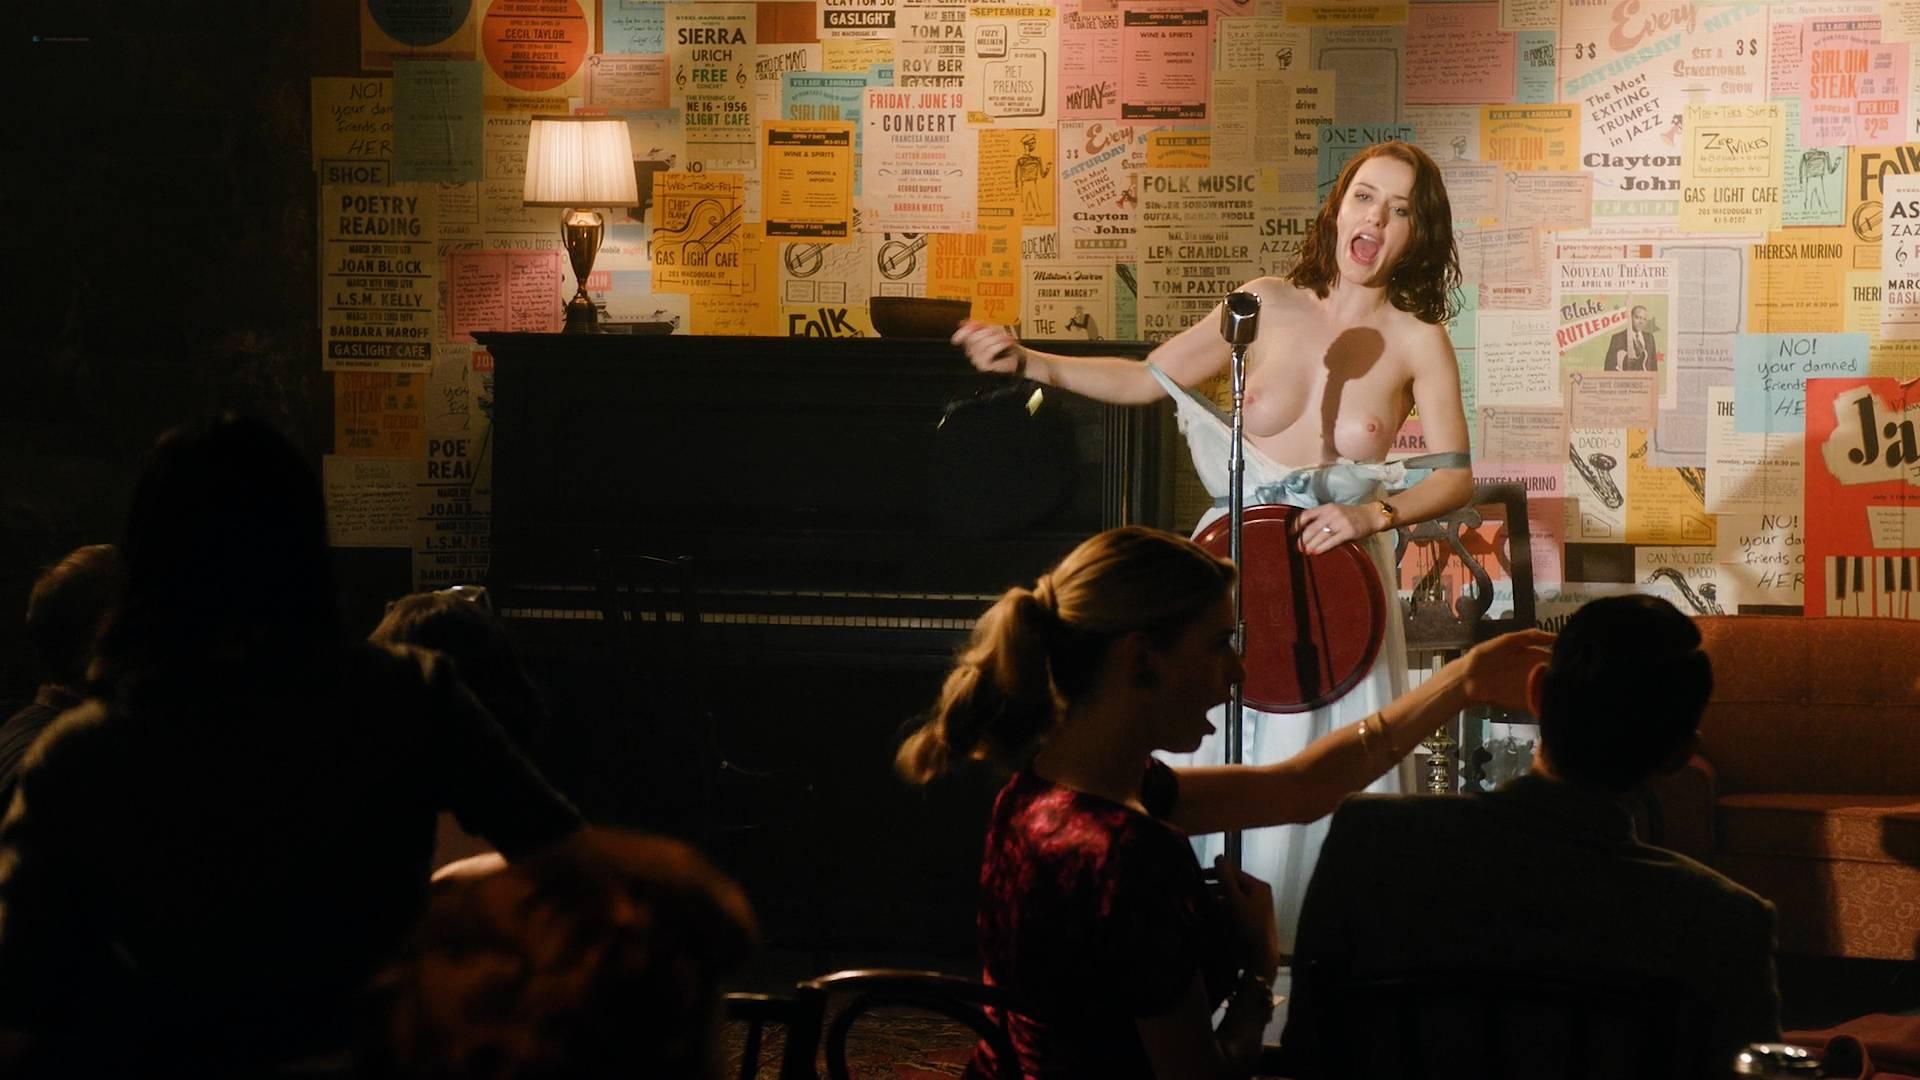 Rachel-Brosnahan-nude-topless-and-butt-Kyla-Walker-hot-The-Marvelous-Mrs-Maisel-2017-s1e1-HD-1080p-00009.jpg